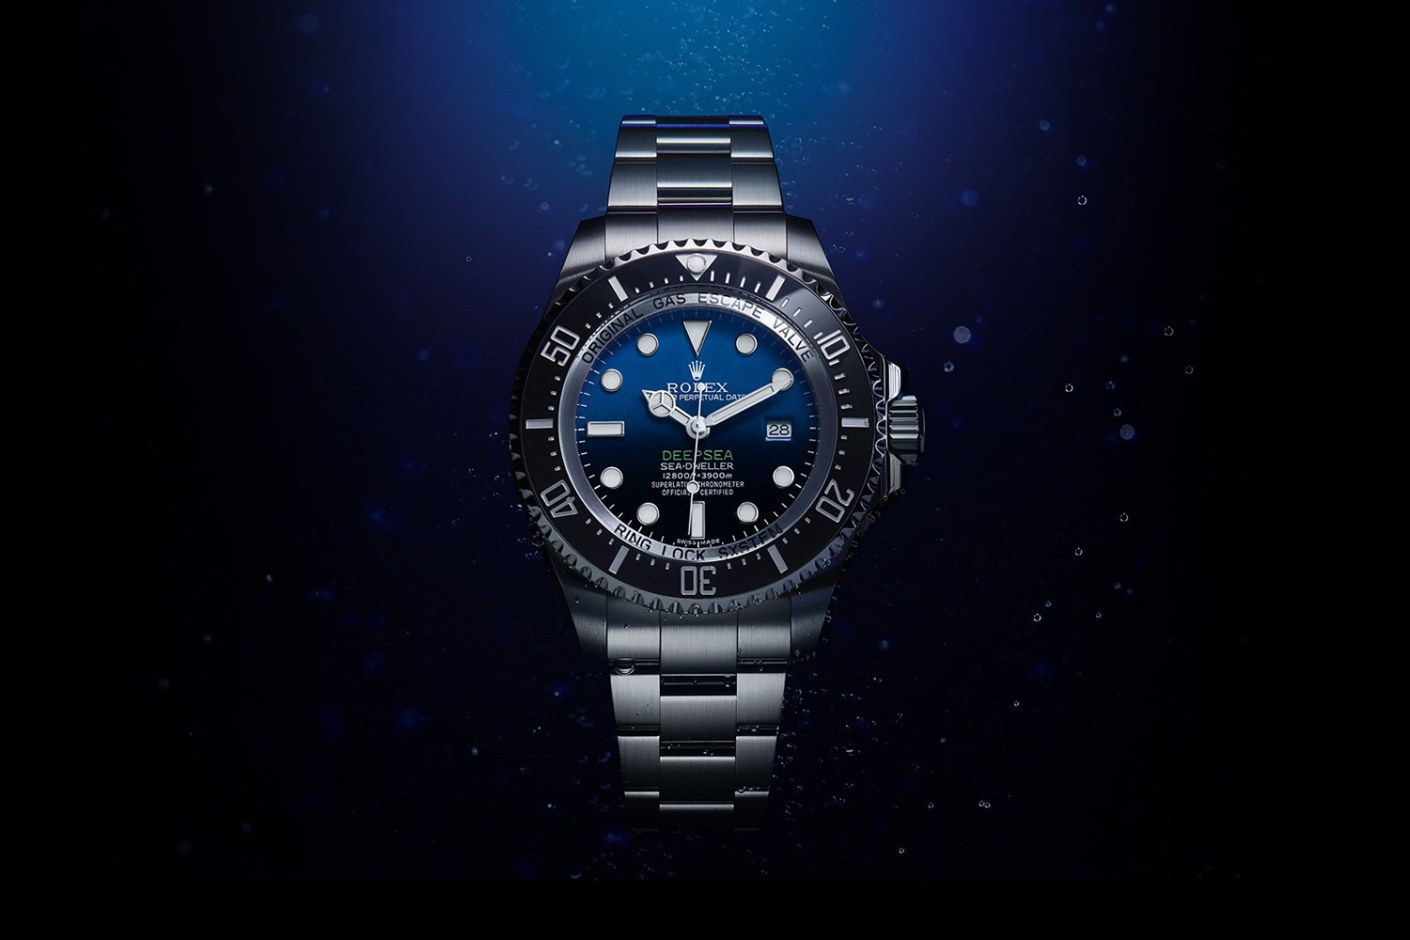 Rolex Deepsea à cadran bleu, hommage à James Cameron